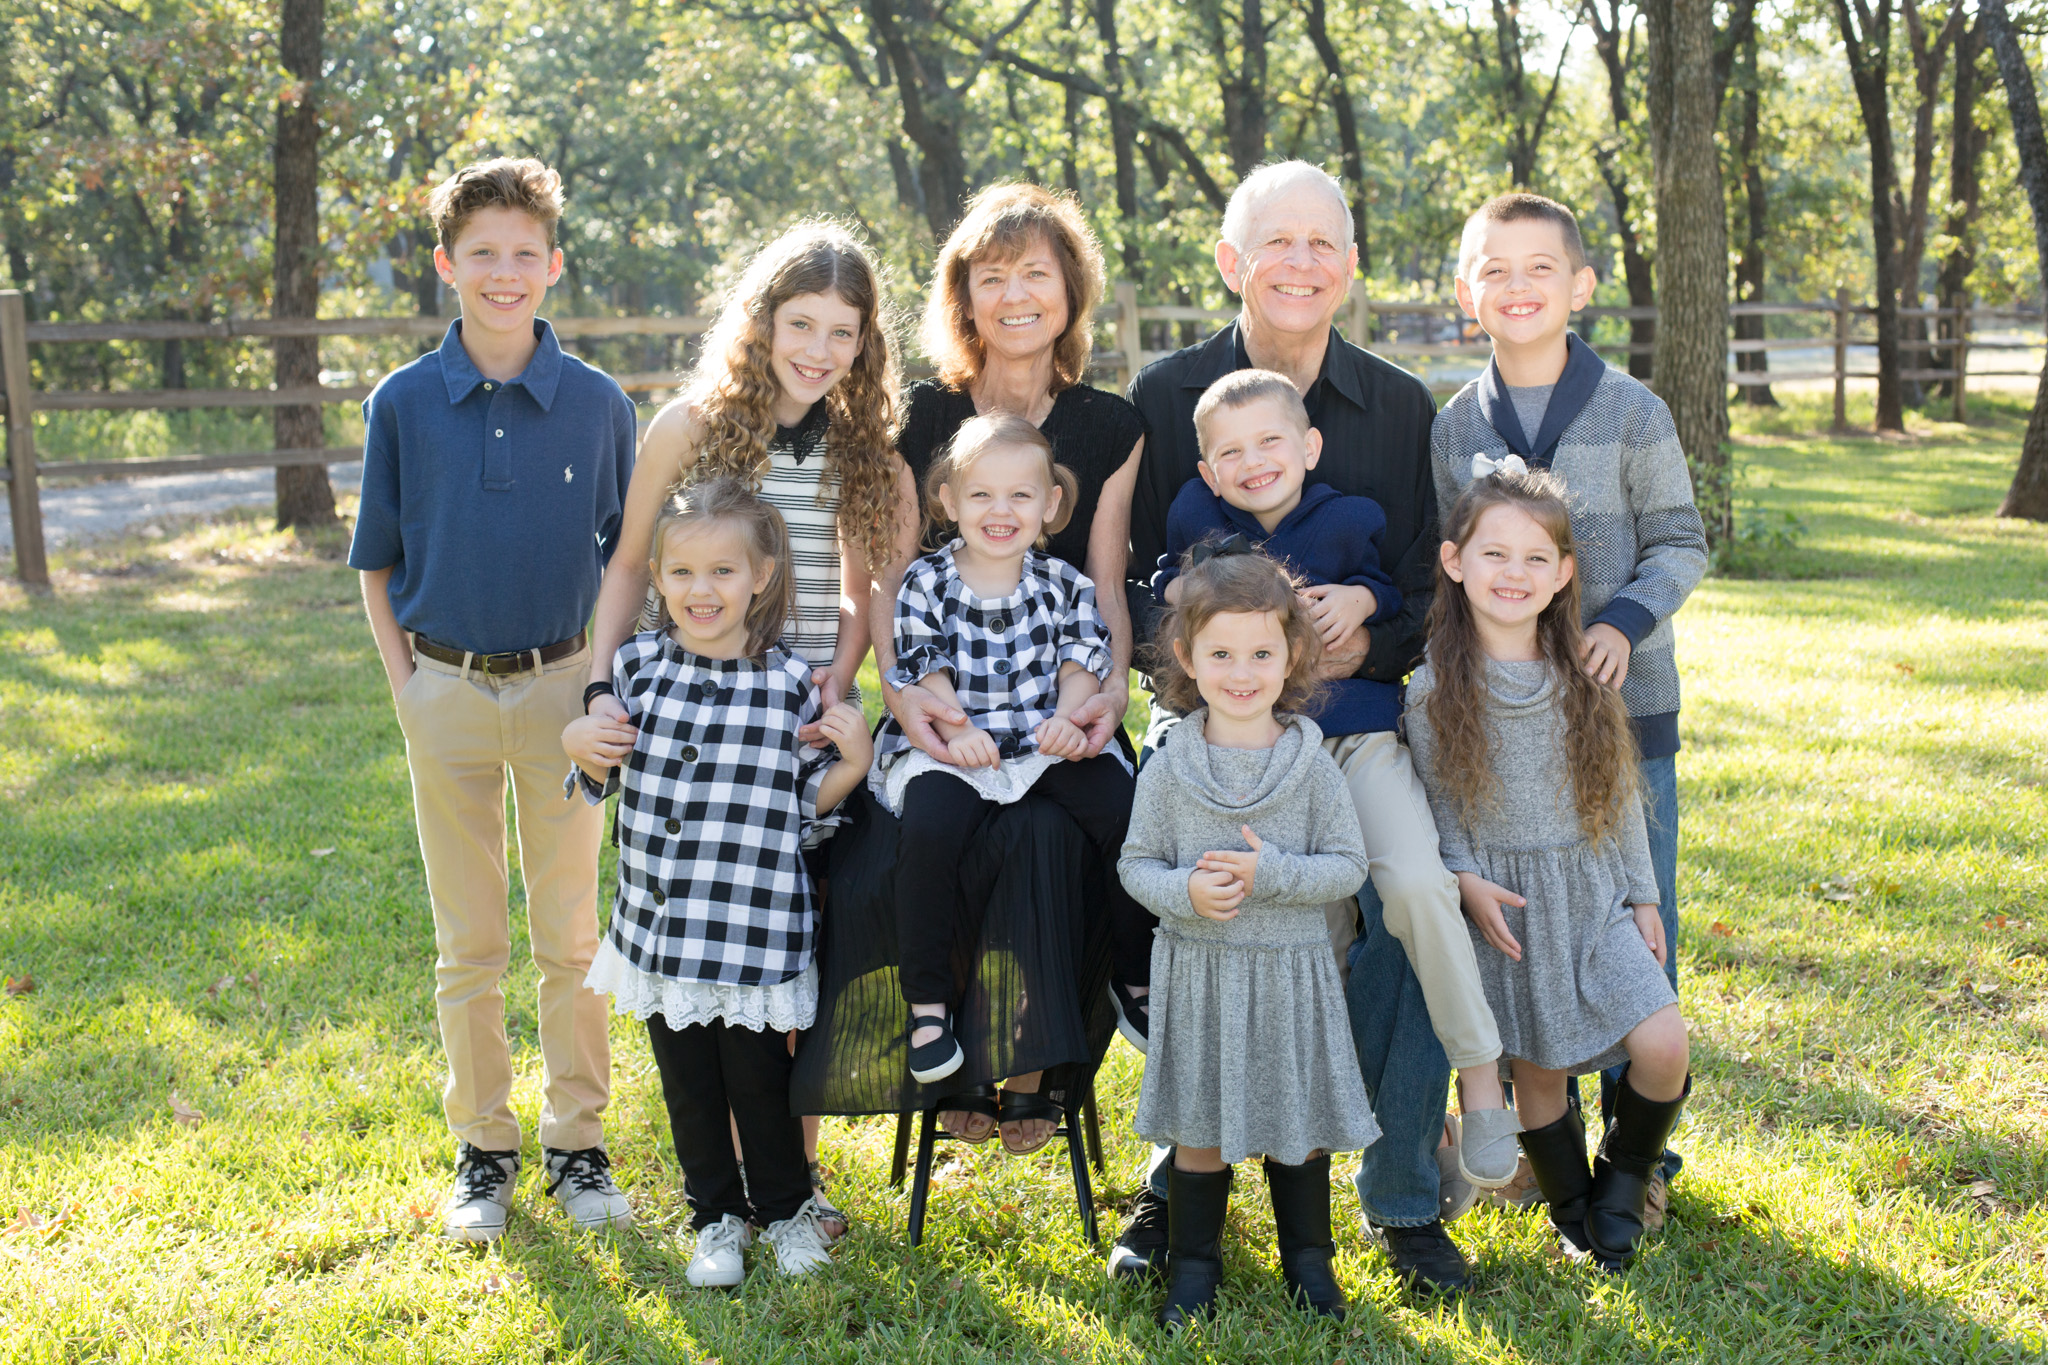 Izehi Photography Dallas Fort Worth Argyle Tx Extended Family Portrait Photographer-101.jpg